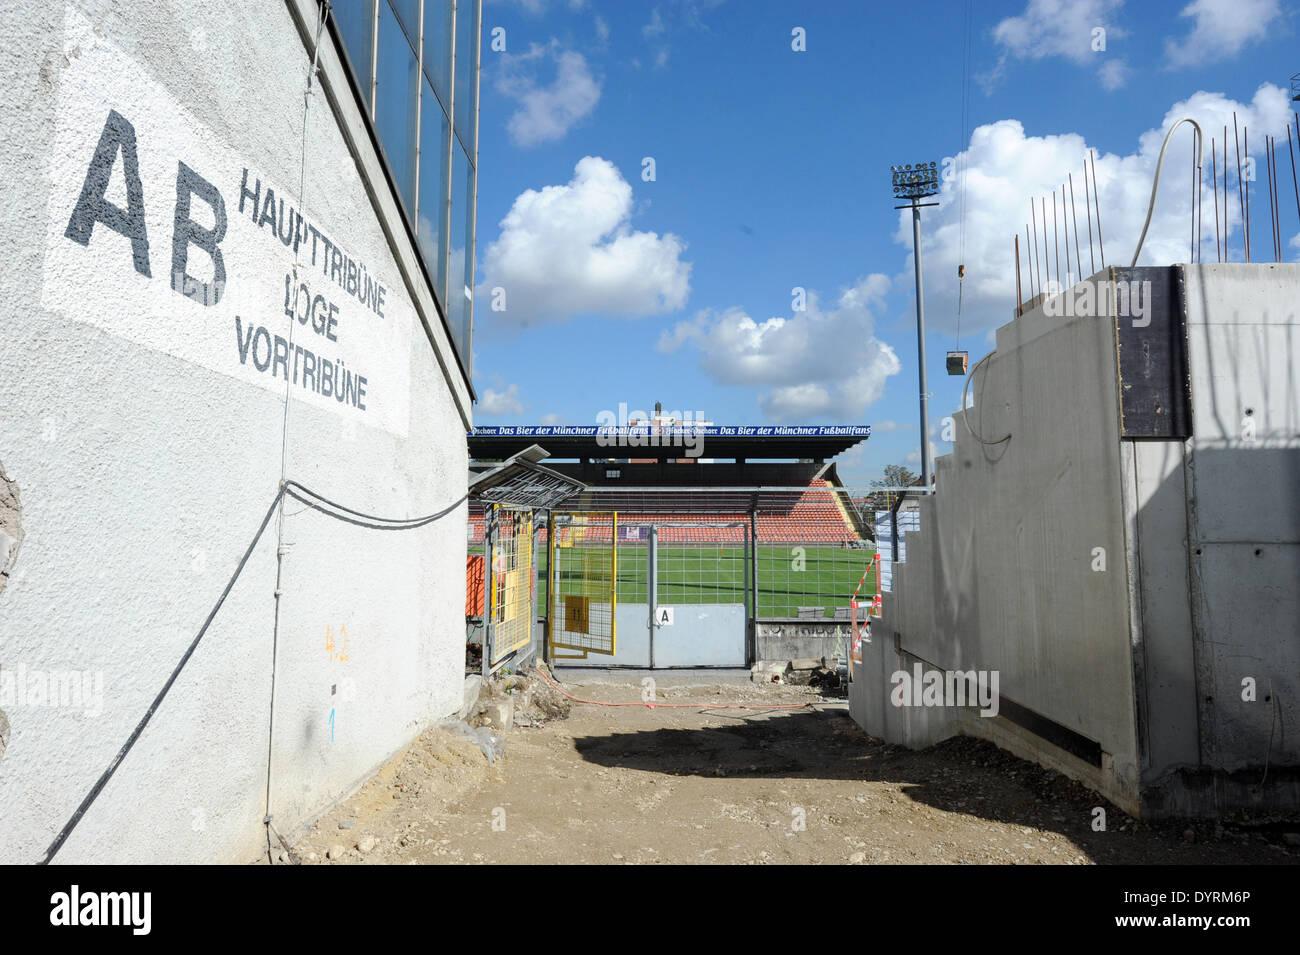 Renovation of the Gruenwalder Stadion in Munich, 2012 - Stock Image